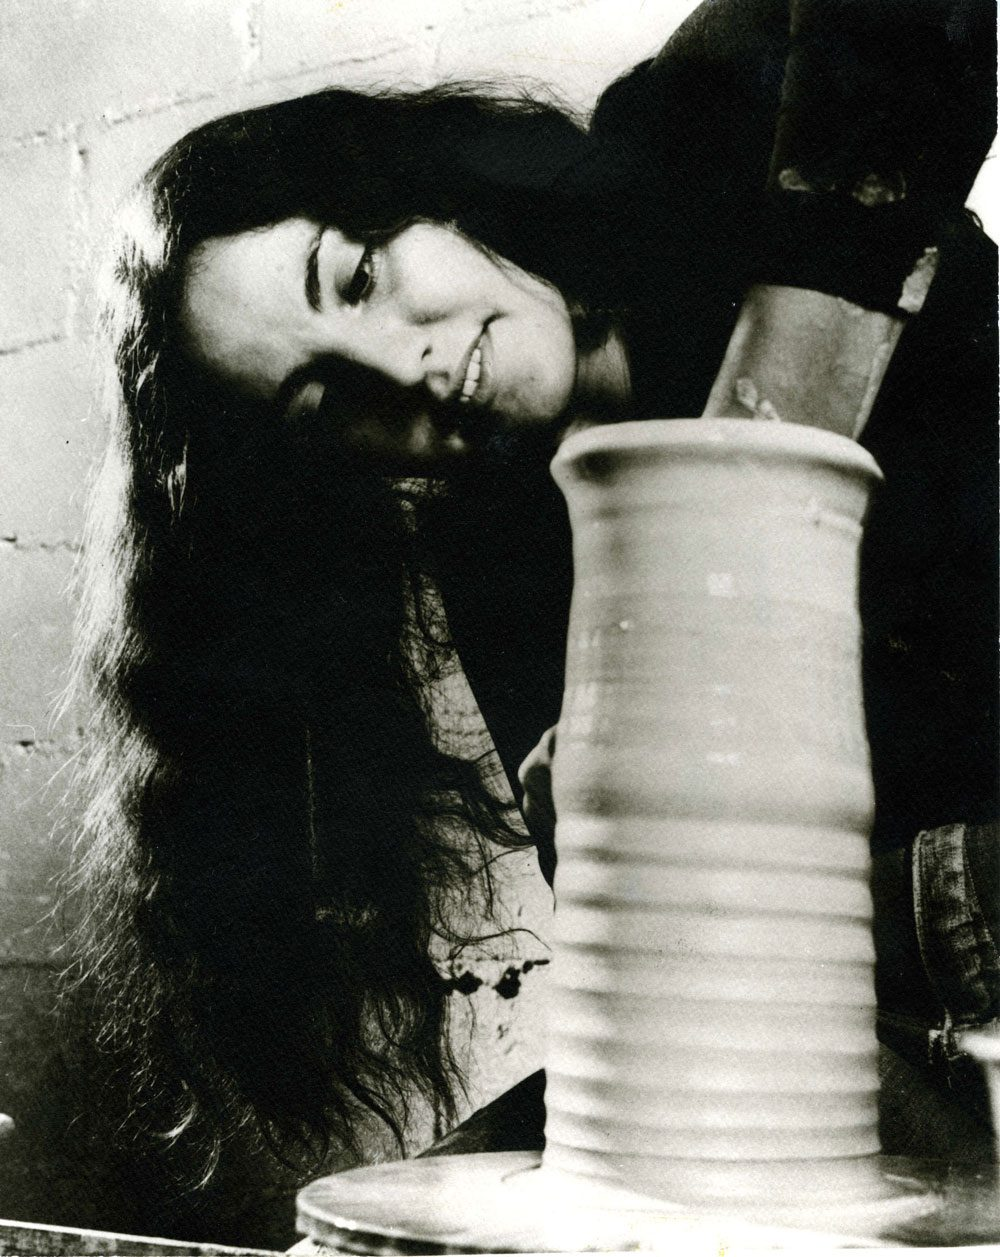 Ree Kaneko working in her studio in 1971. Photo courtesy Ree Kaneko.